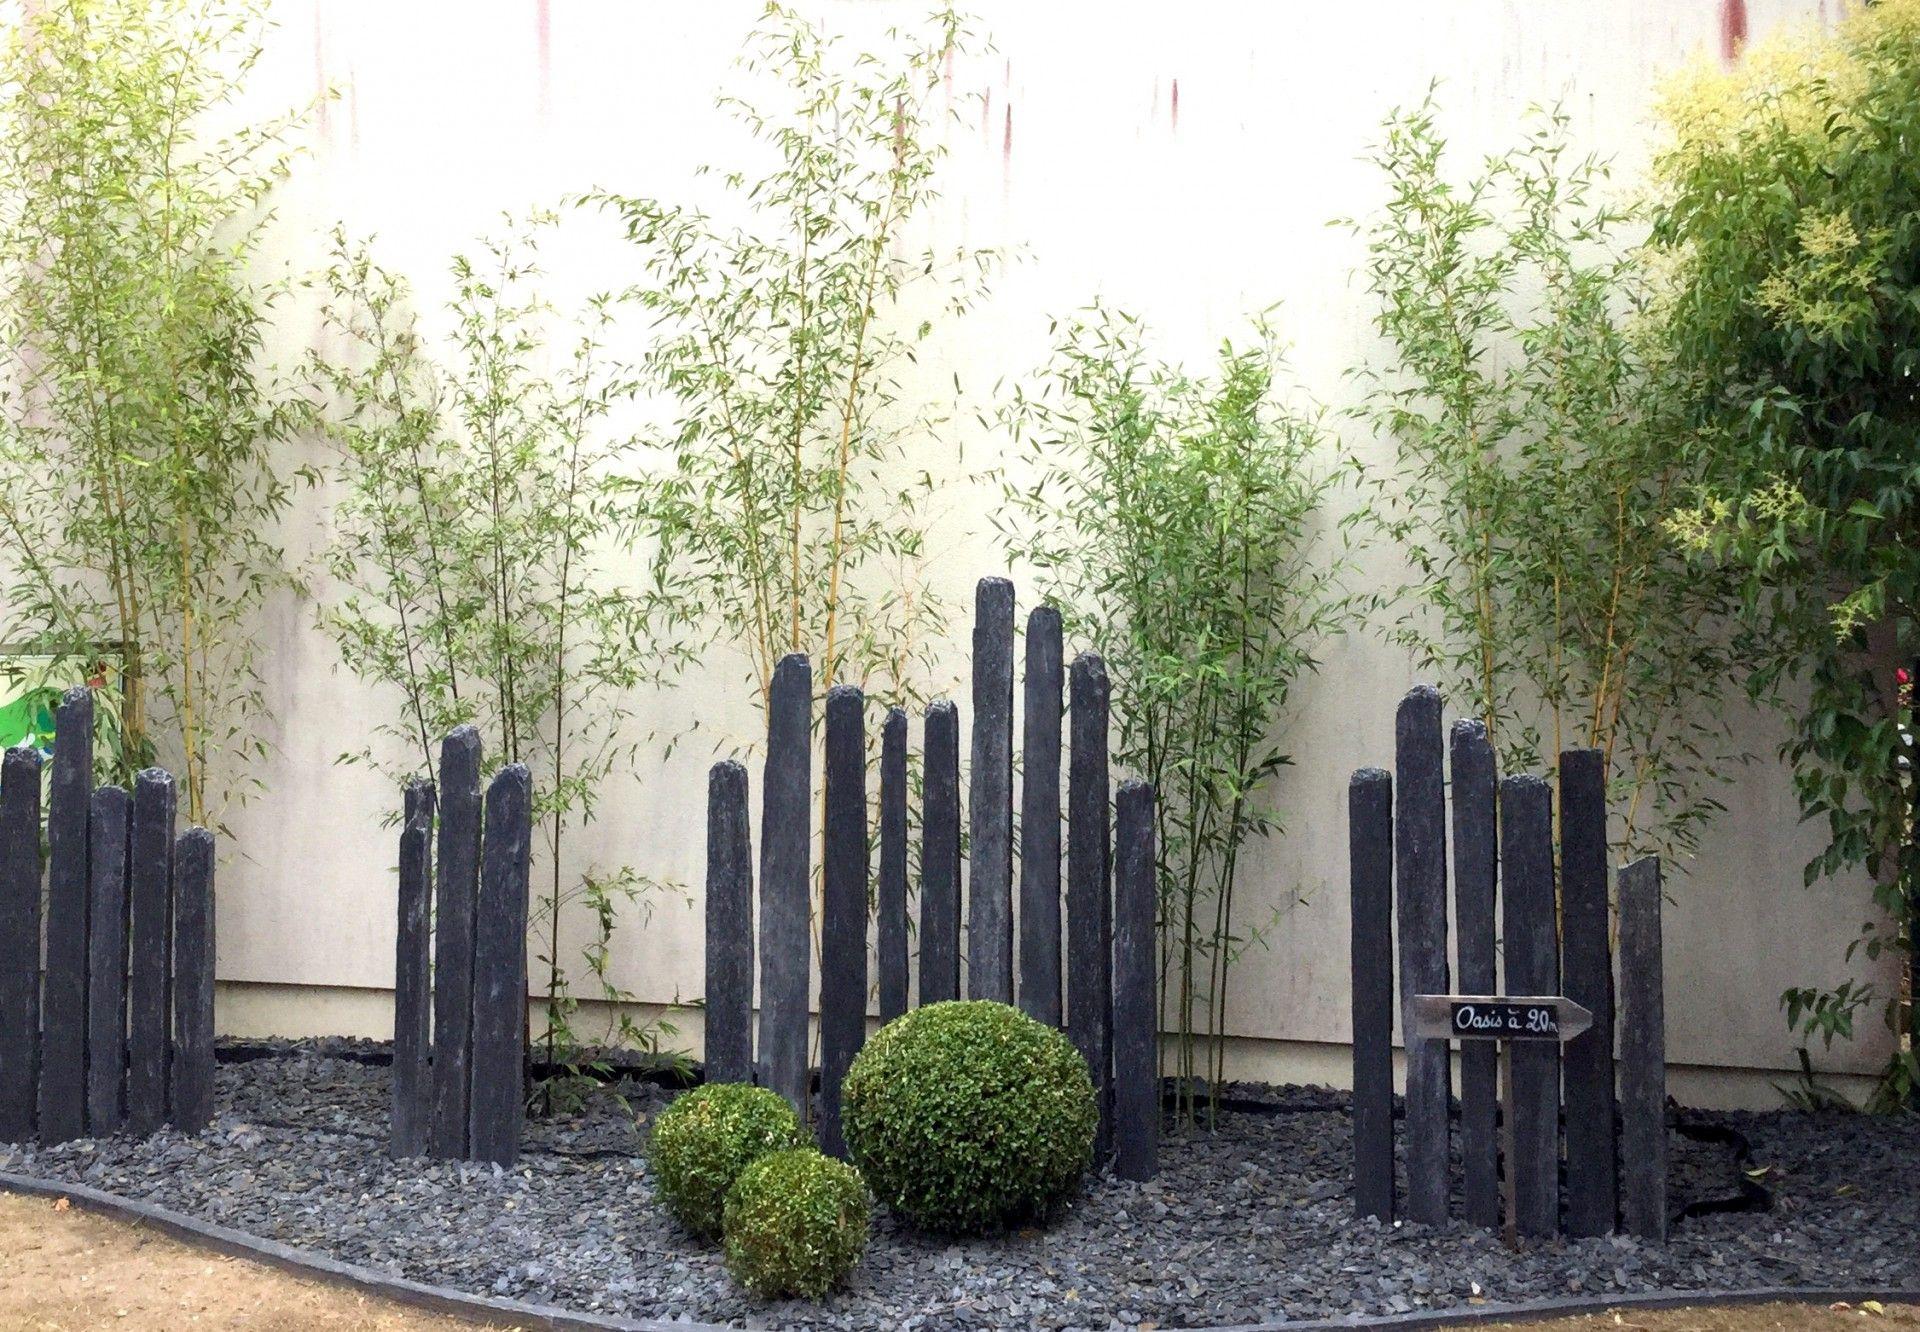 Piquet En Ardoise Bois Jardin piquet en ardoise bois jardin - recherche google